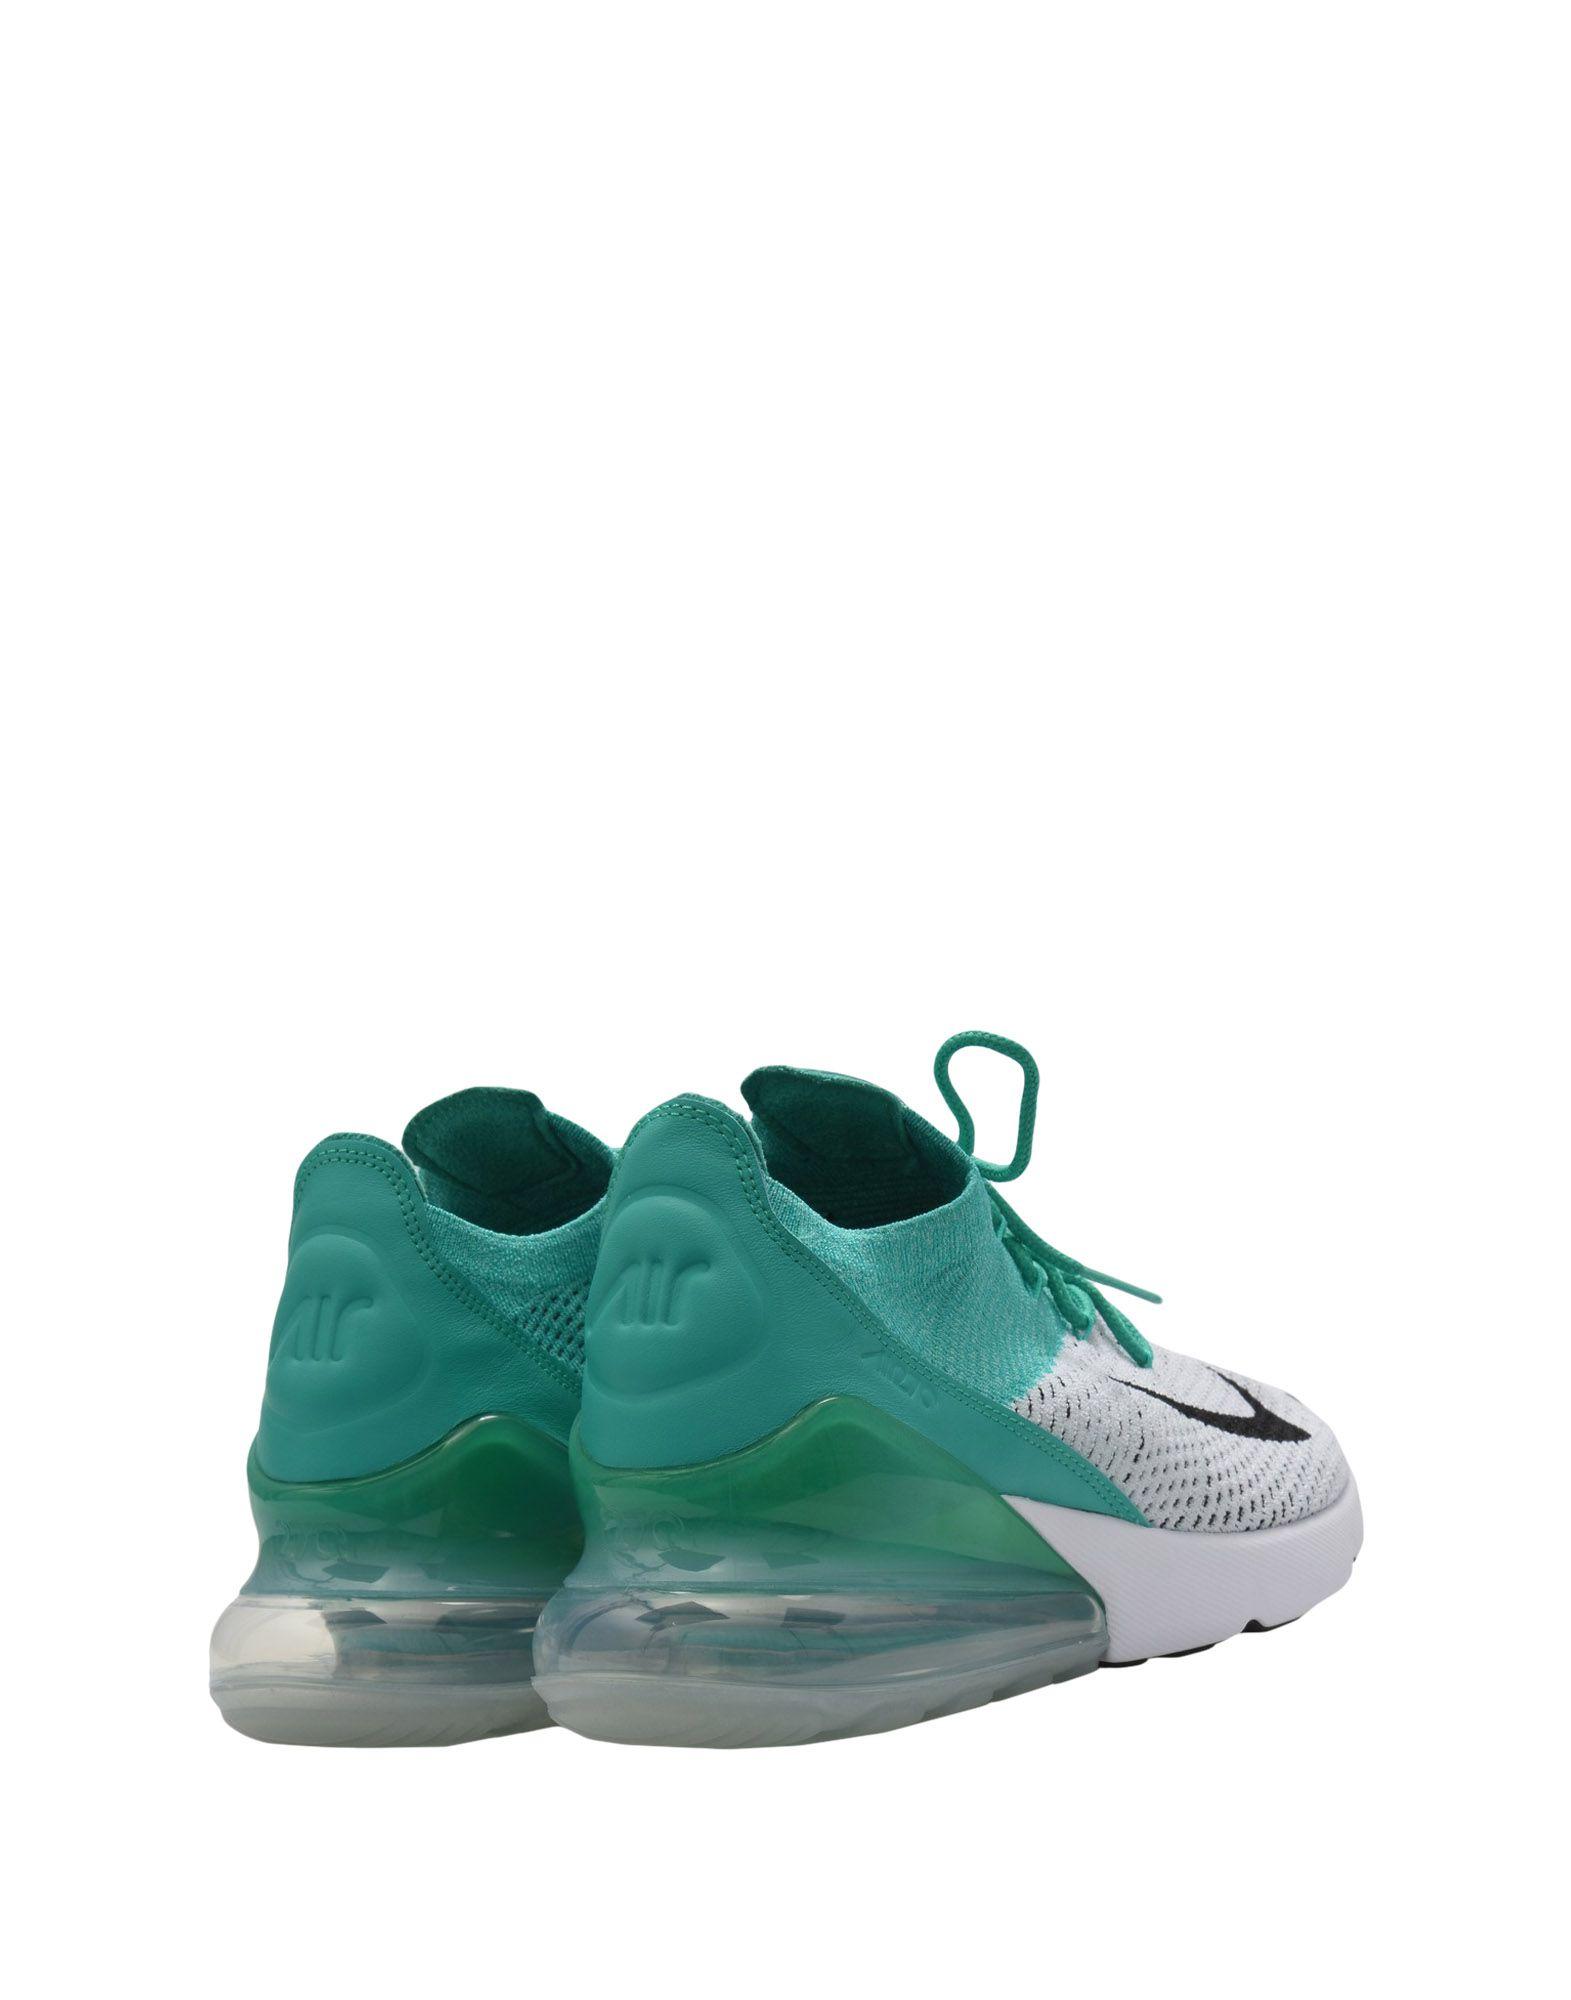 270 Flyknit Femmes Baskets Tennis W Air Nike Max CfnTB4qCa